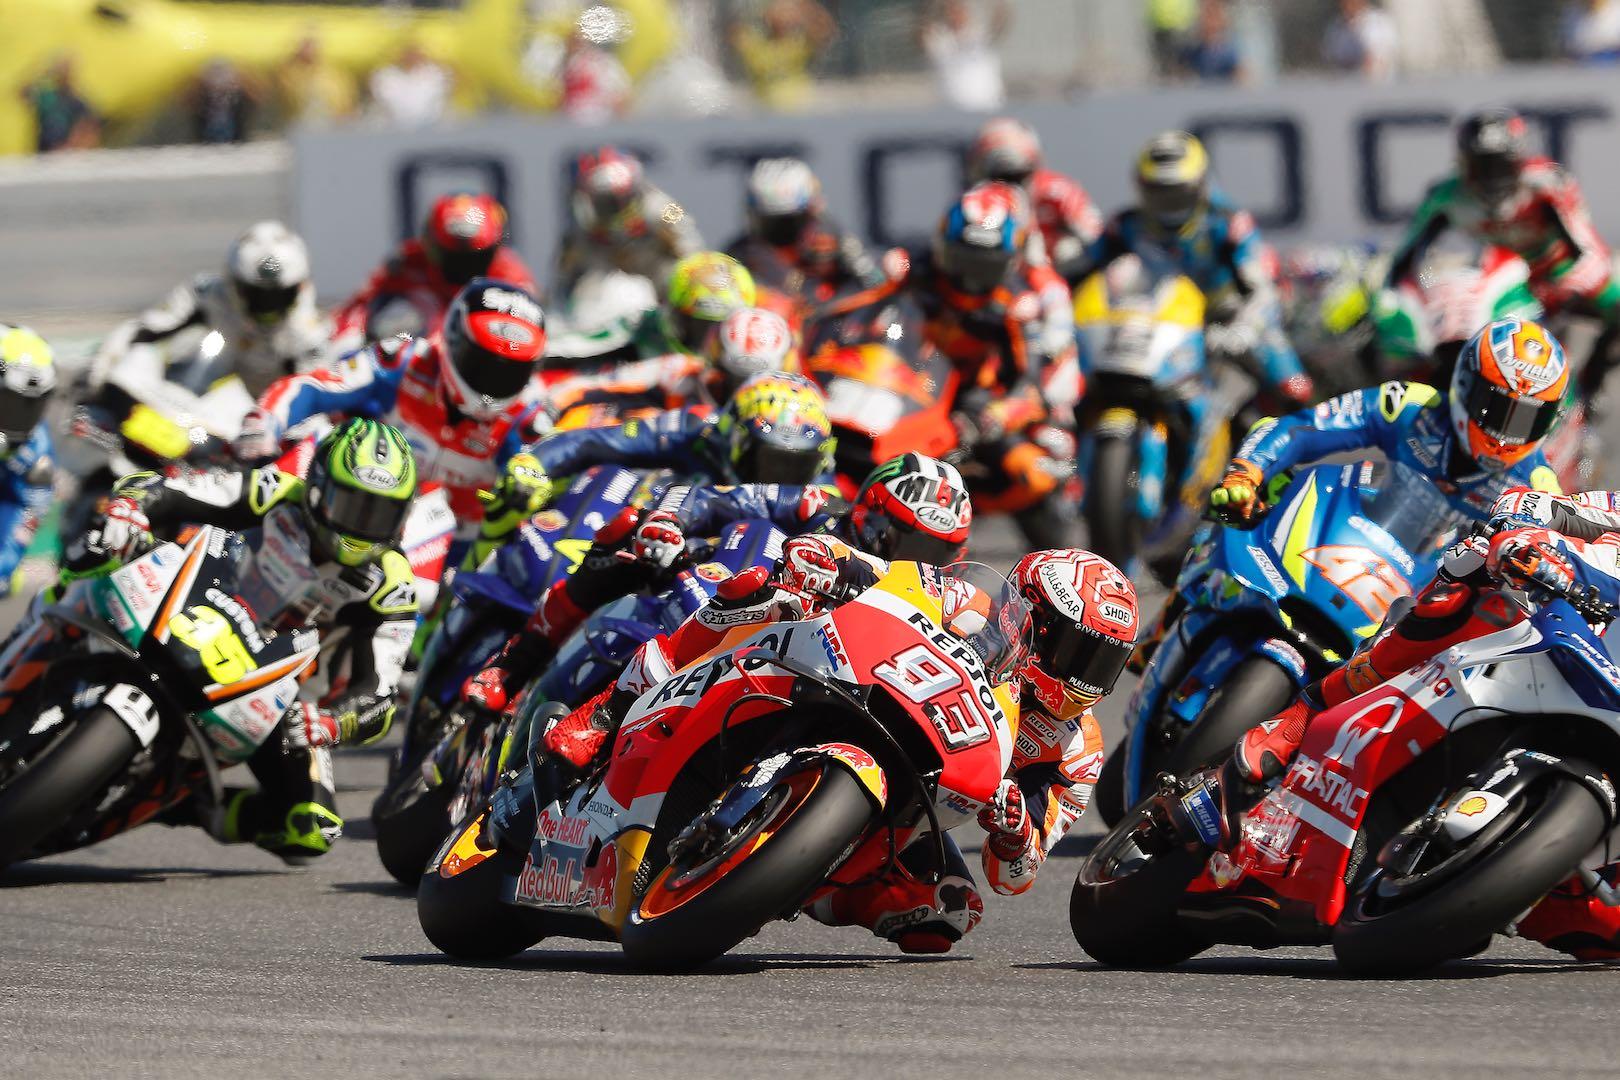 34fa3dfcbac 2018 Misano MotoGP Results (San Marino Grand Prix Recap)